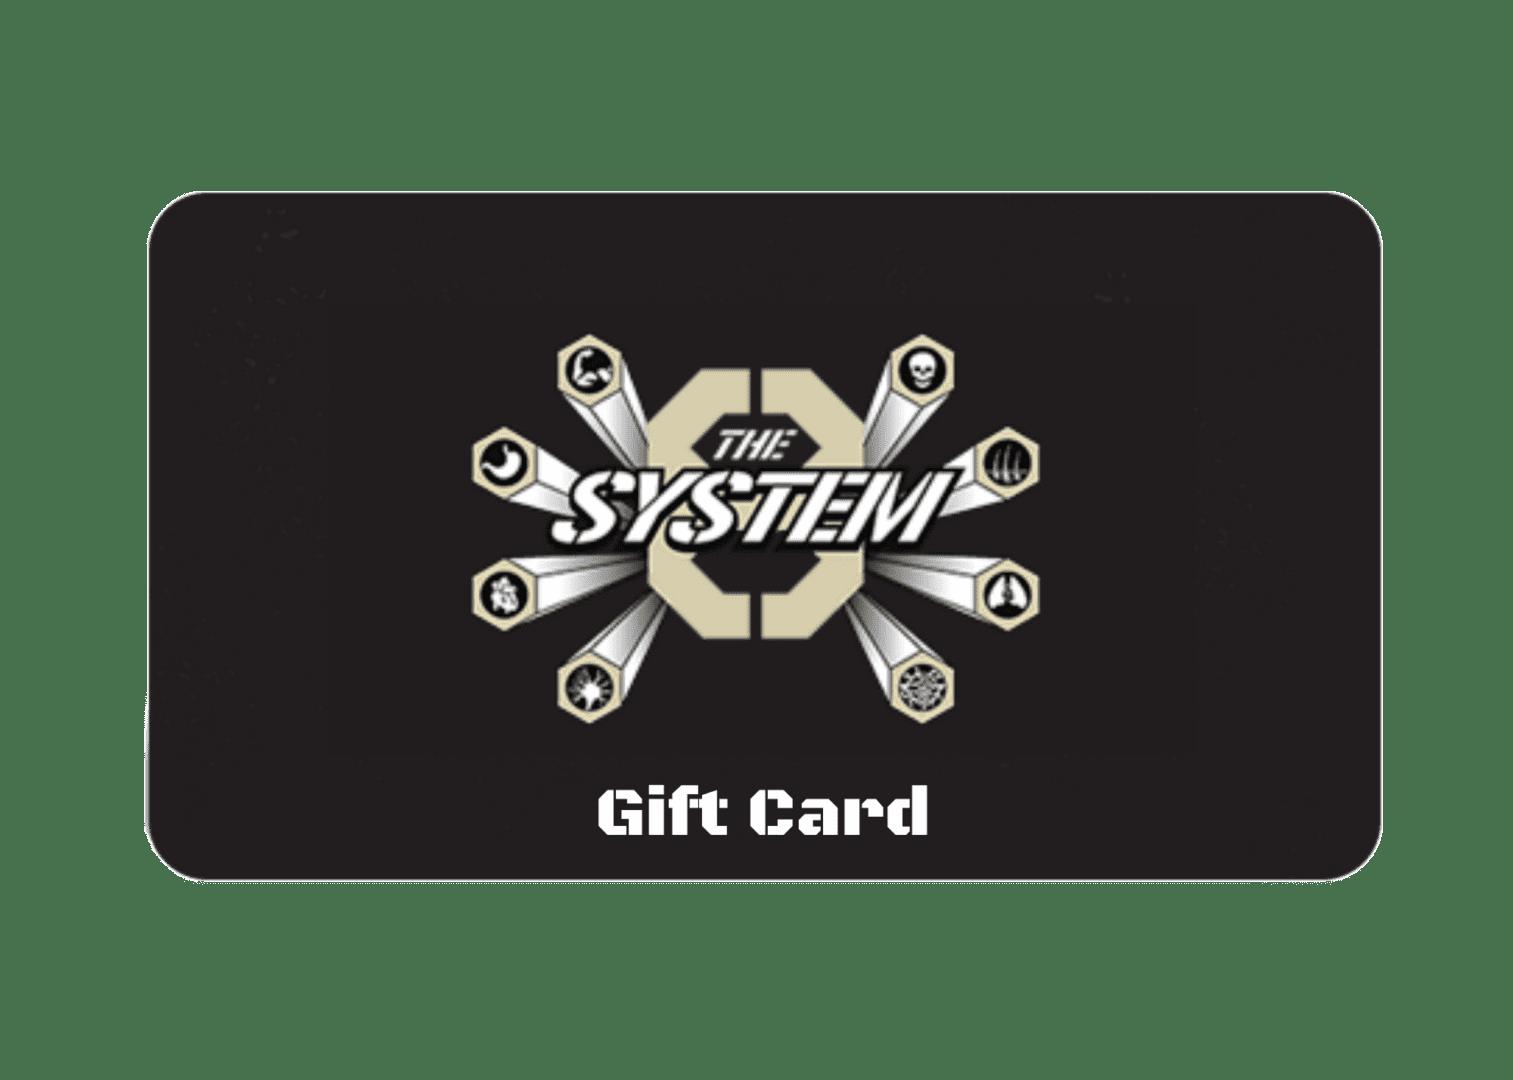 TS8 Gift Card